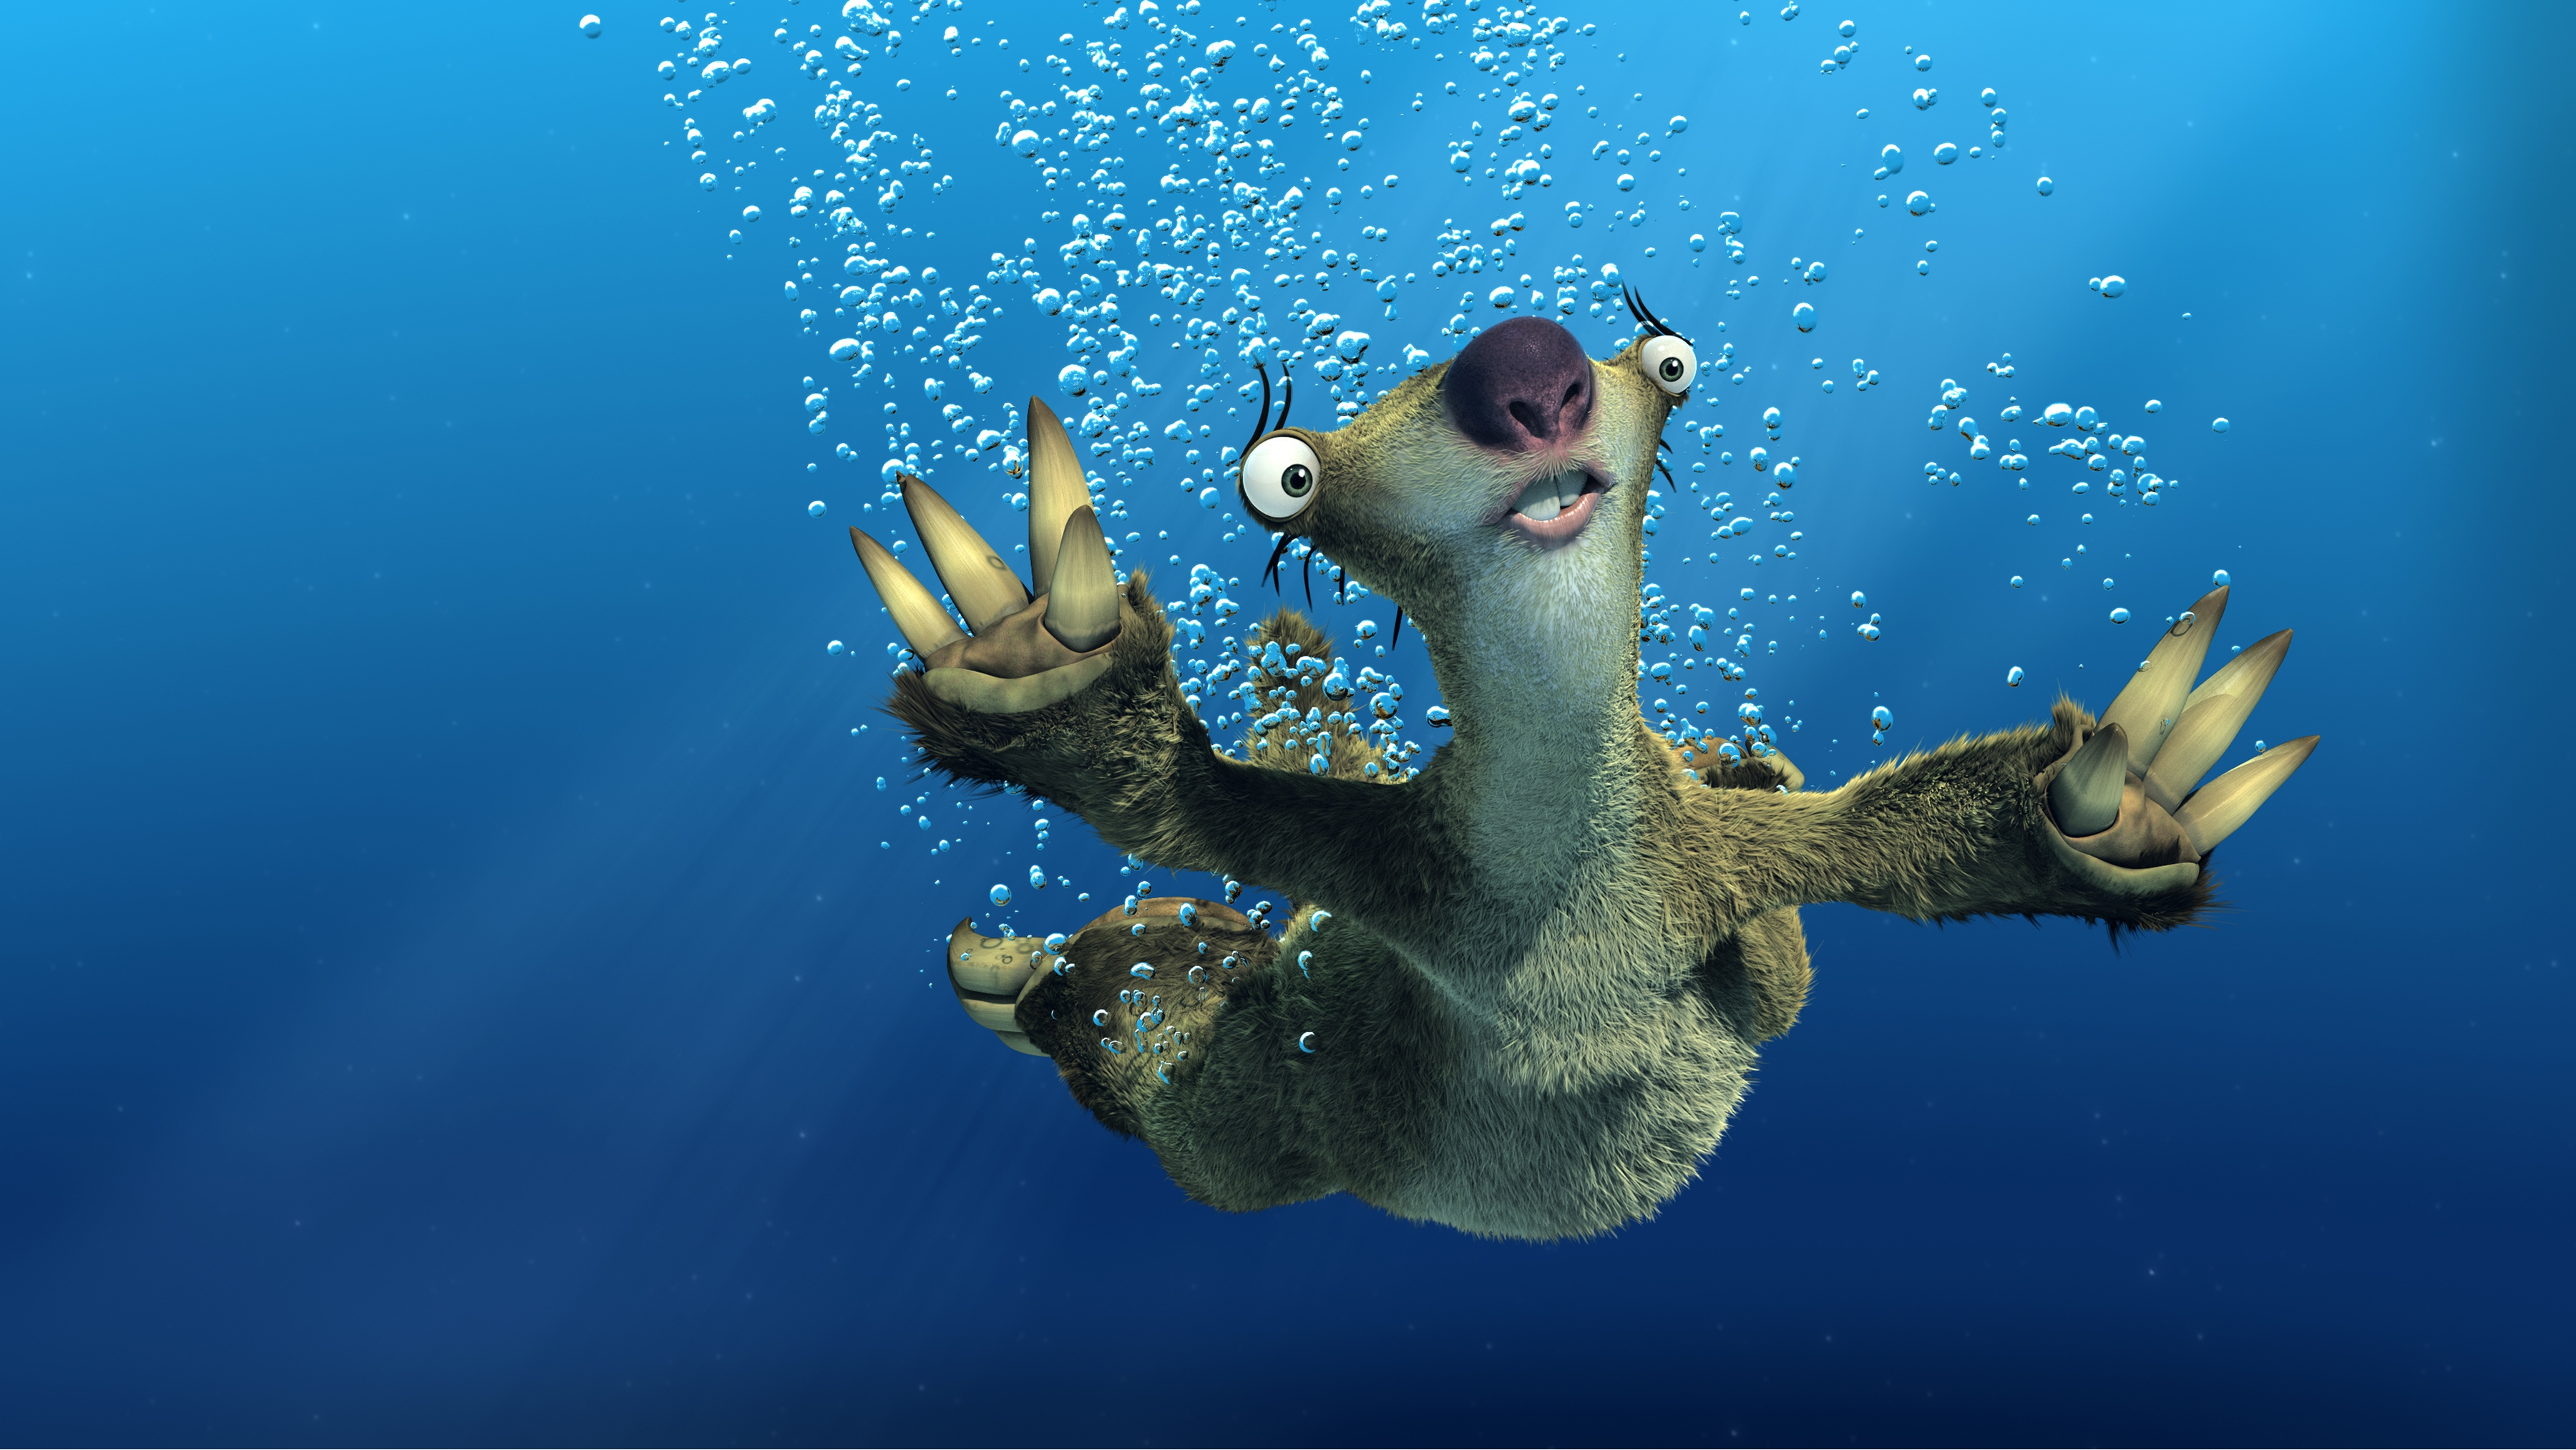 ice age sloth sid hd wall paper